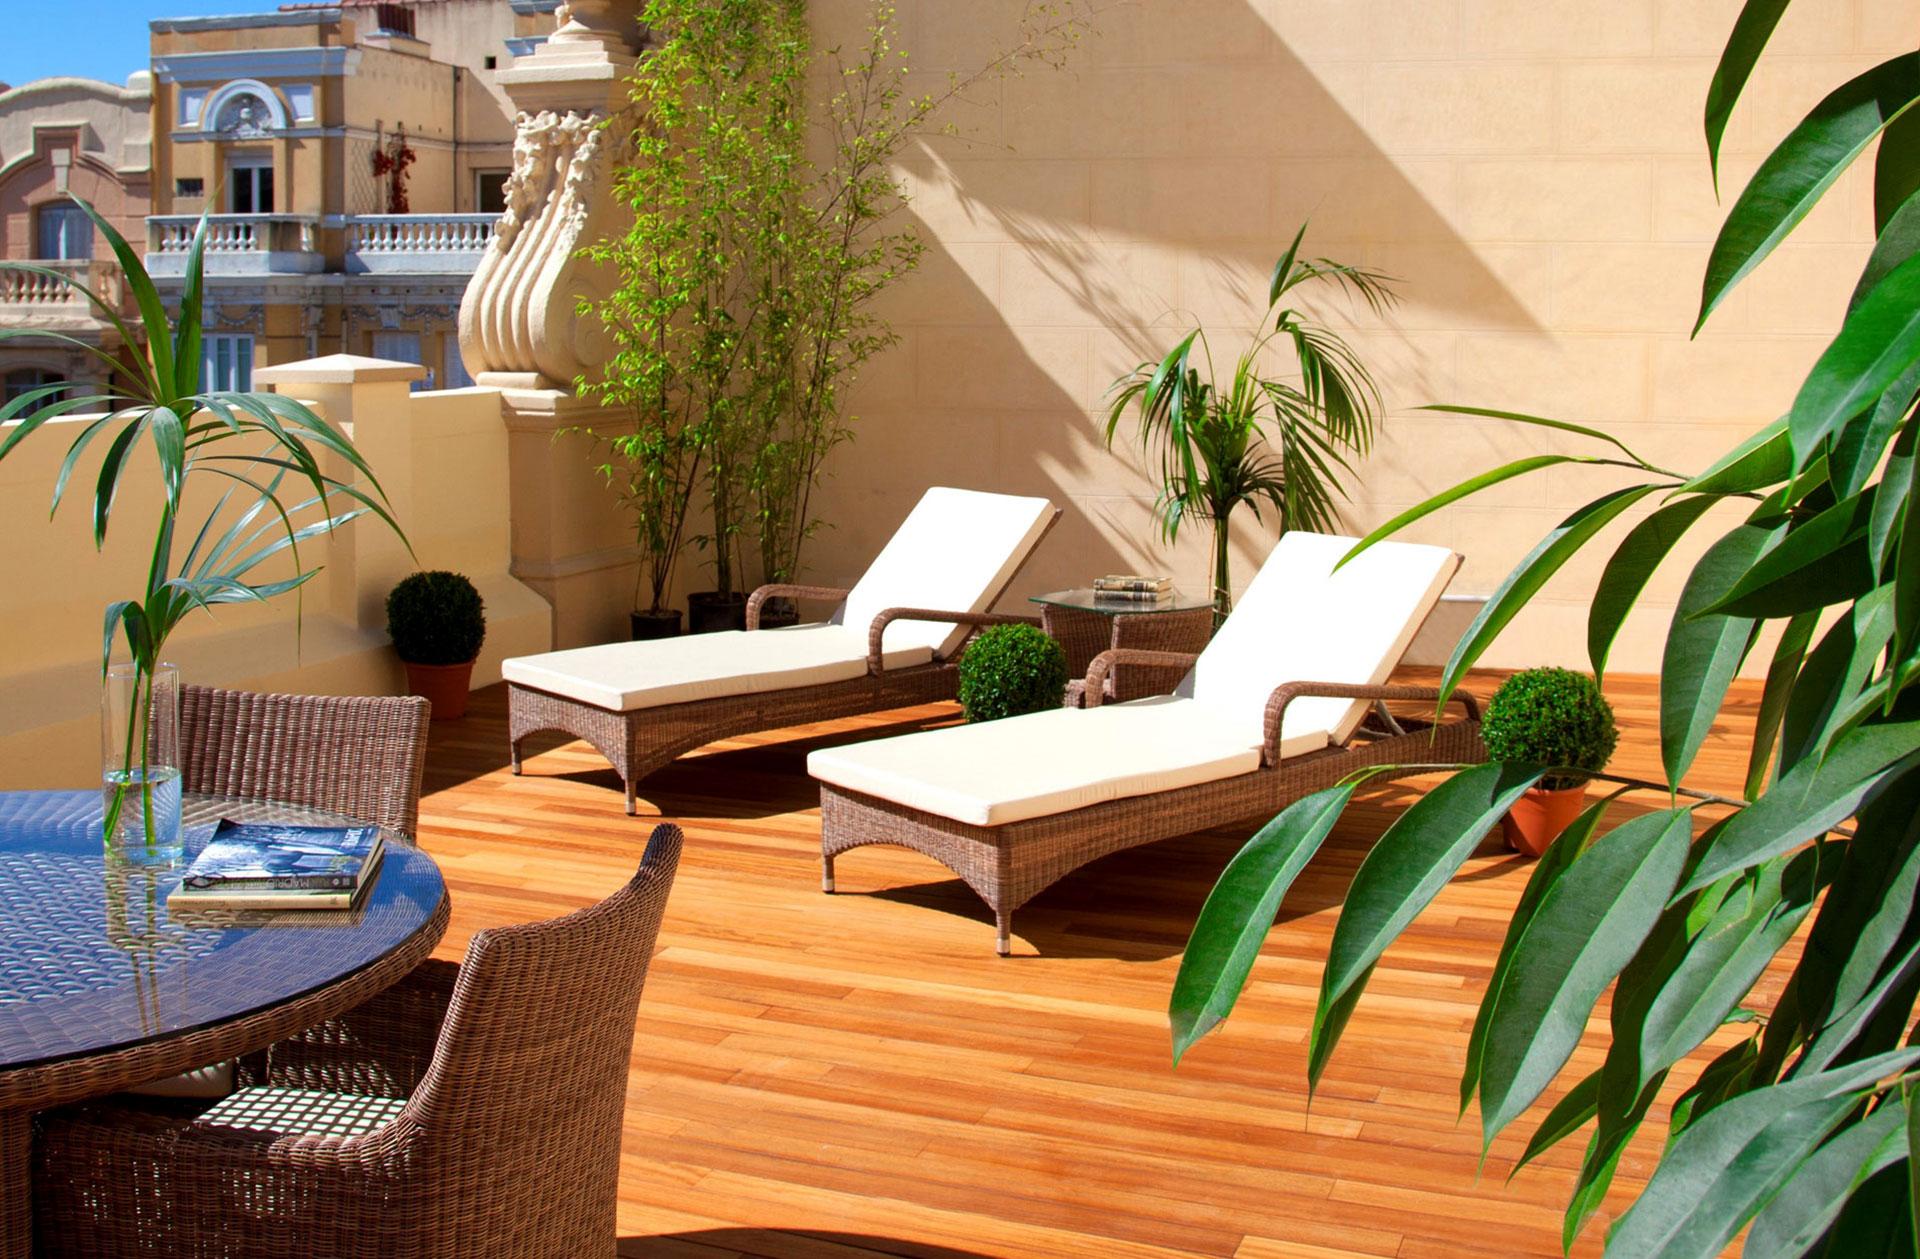 URSO-Suite-Terraza-Habitacion-URSO-Hotel-Spa-Madrid-1.jpg